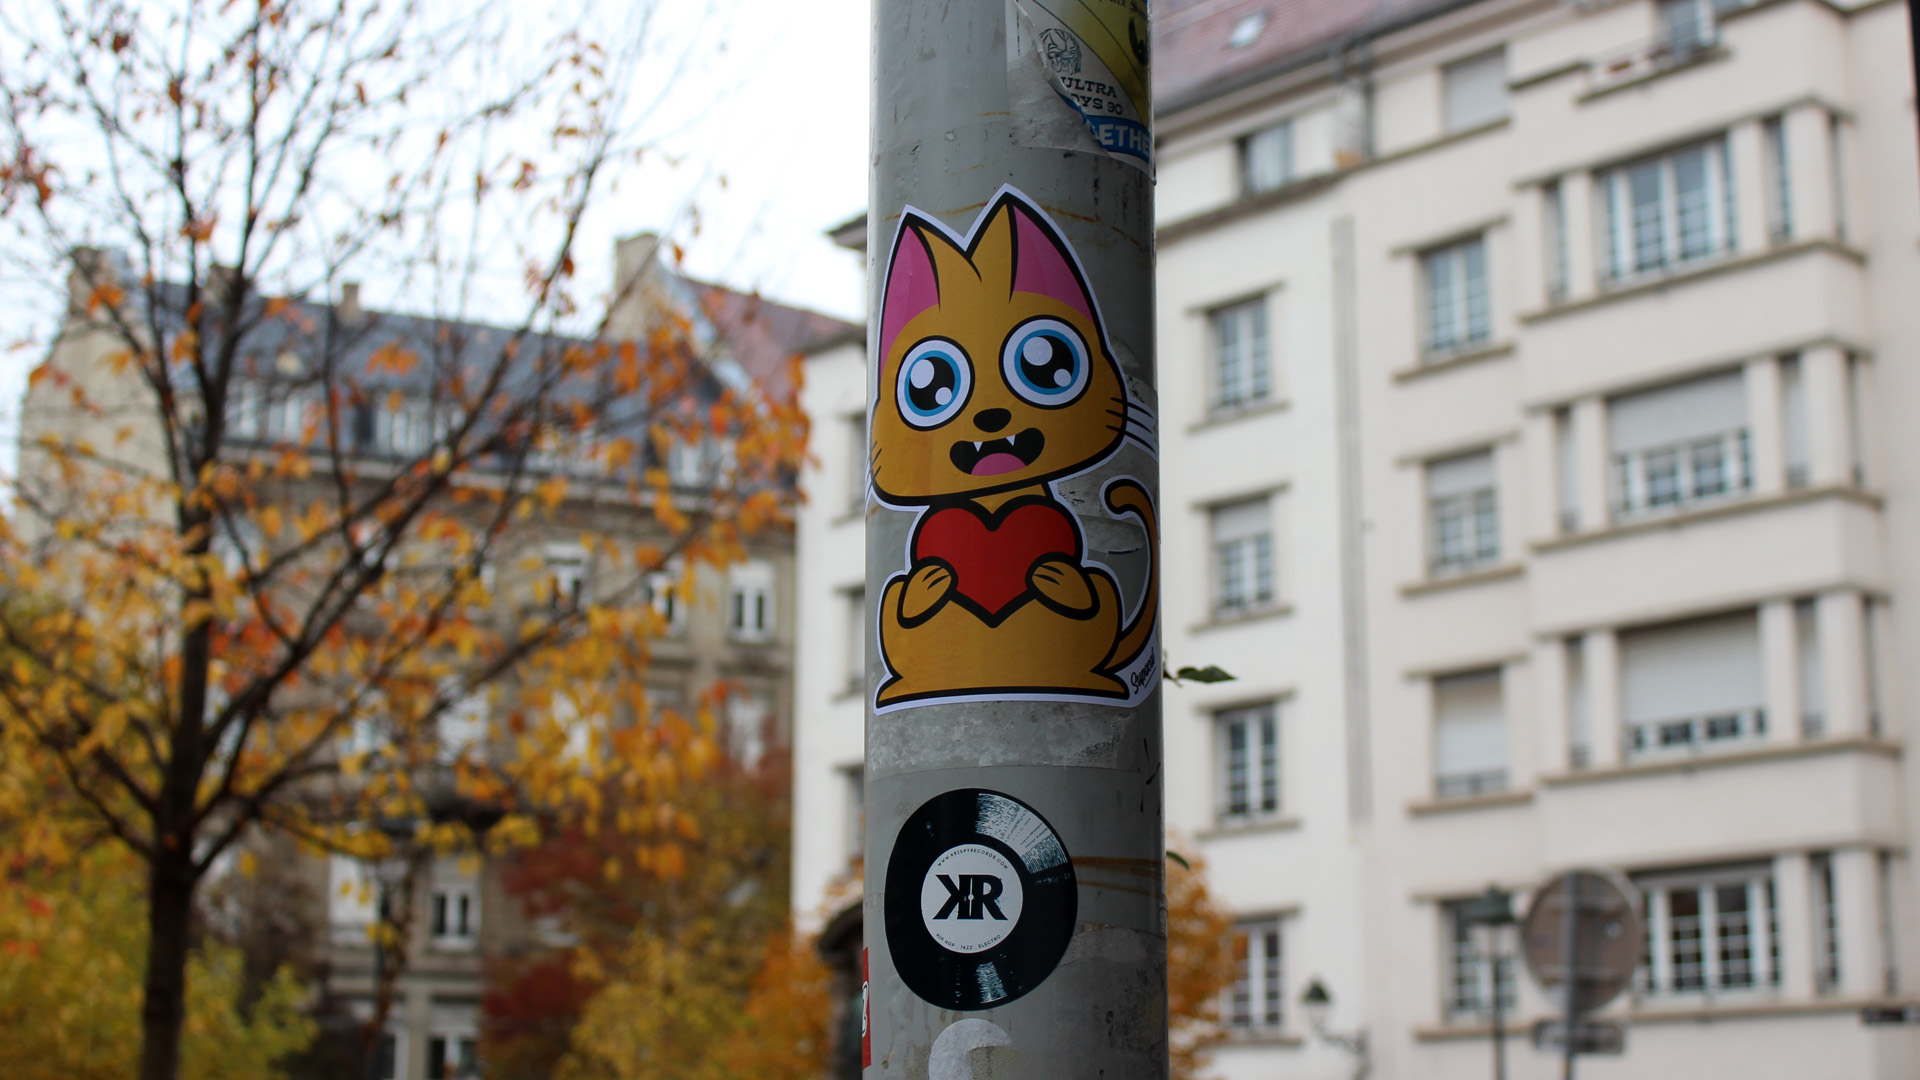 Supacat Strasbourg Always L O V E - Supacat Street Art à Strasbourg